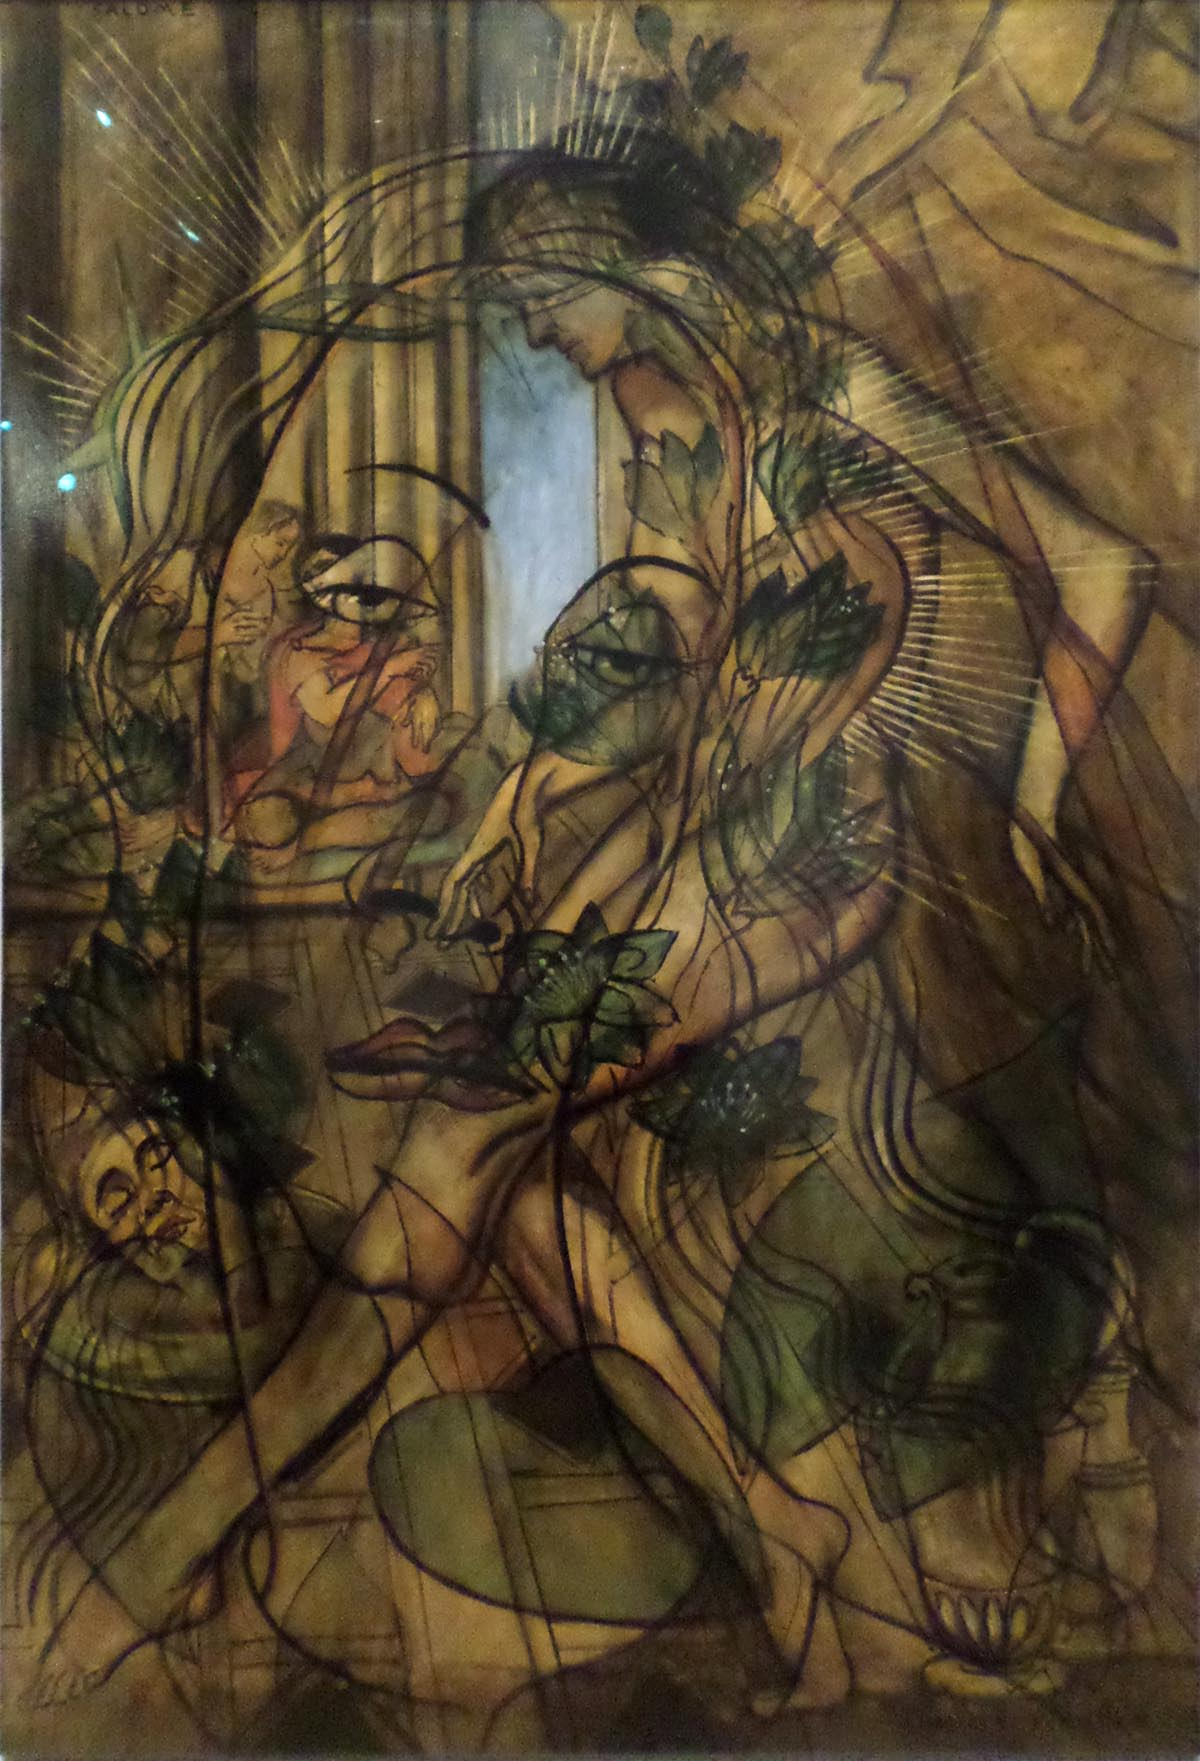 Salomé (1930)